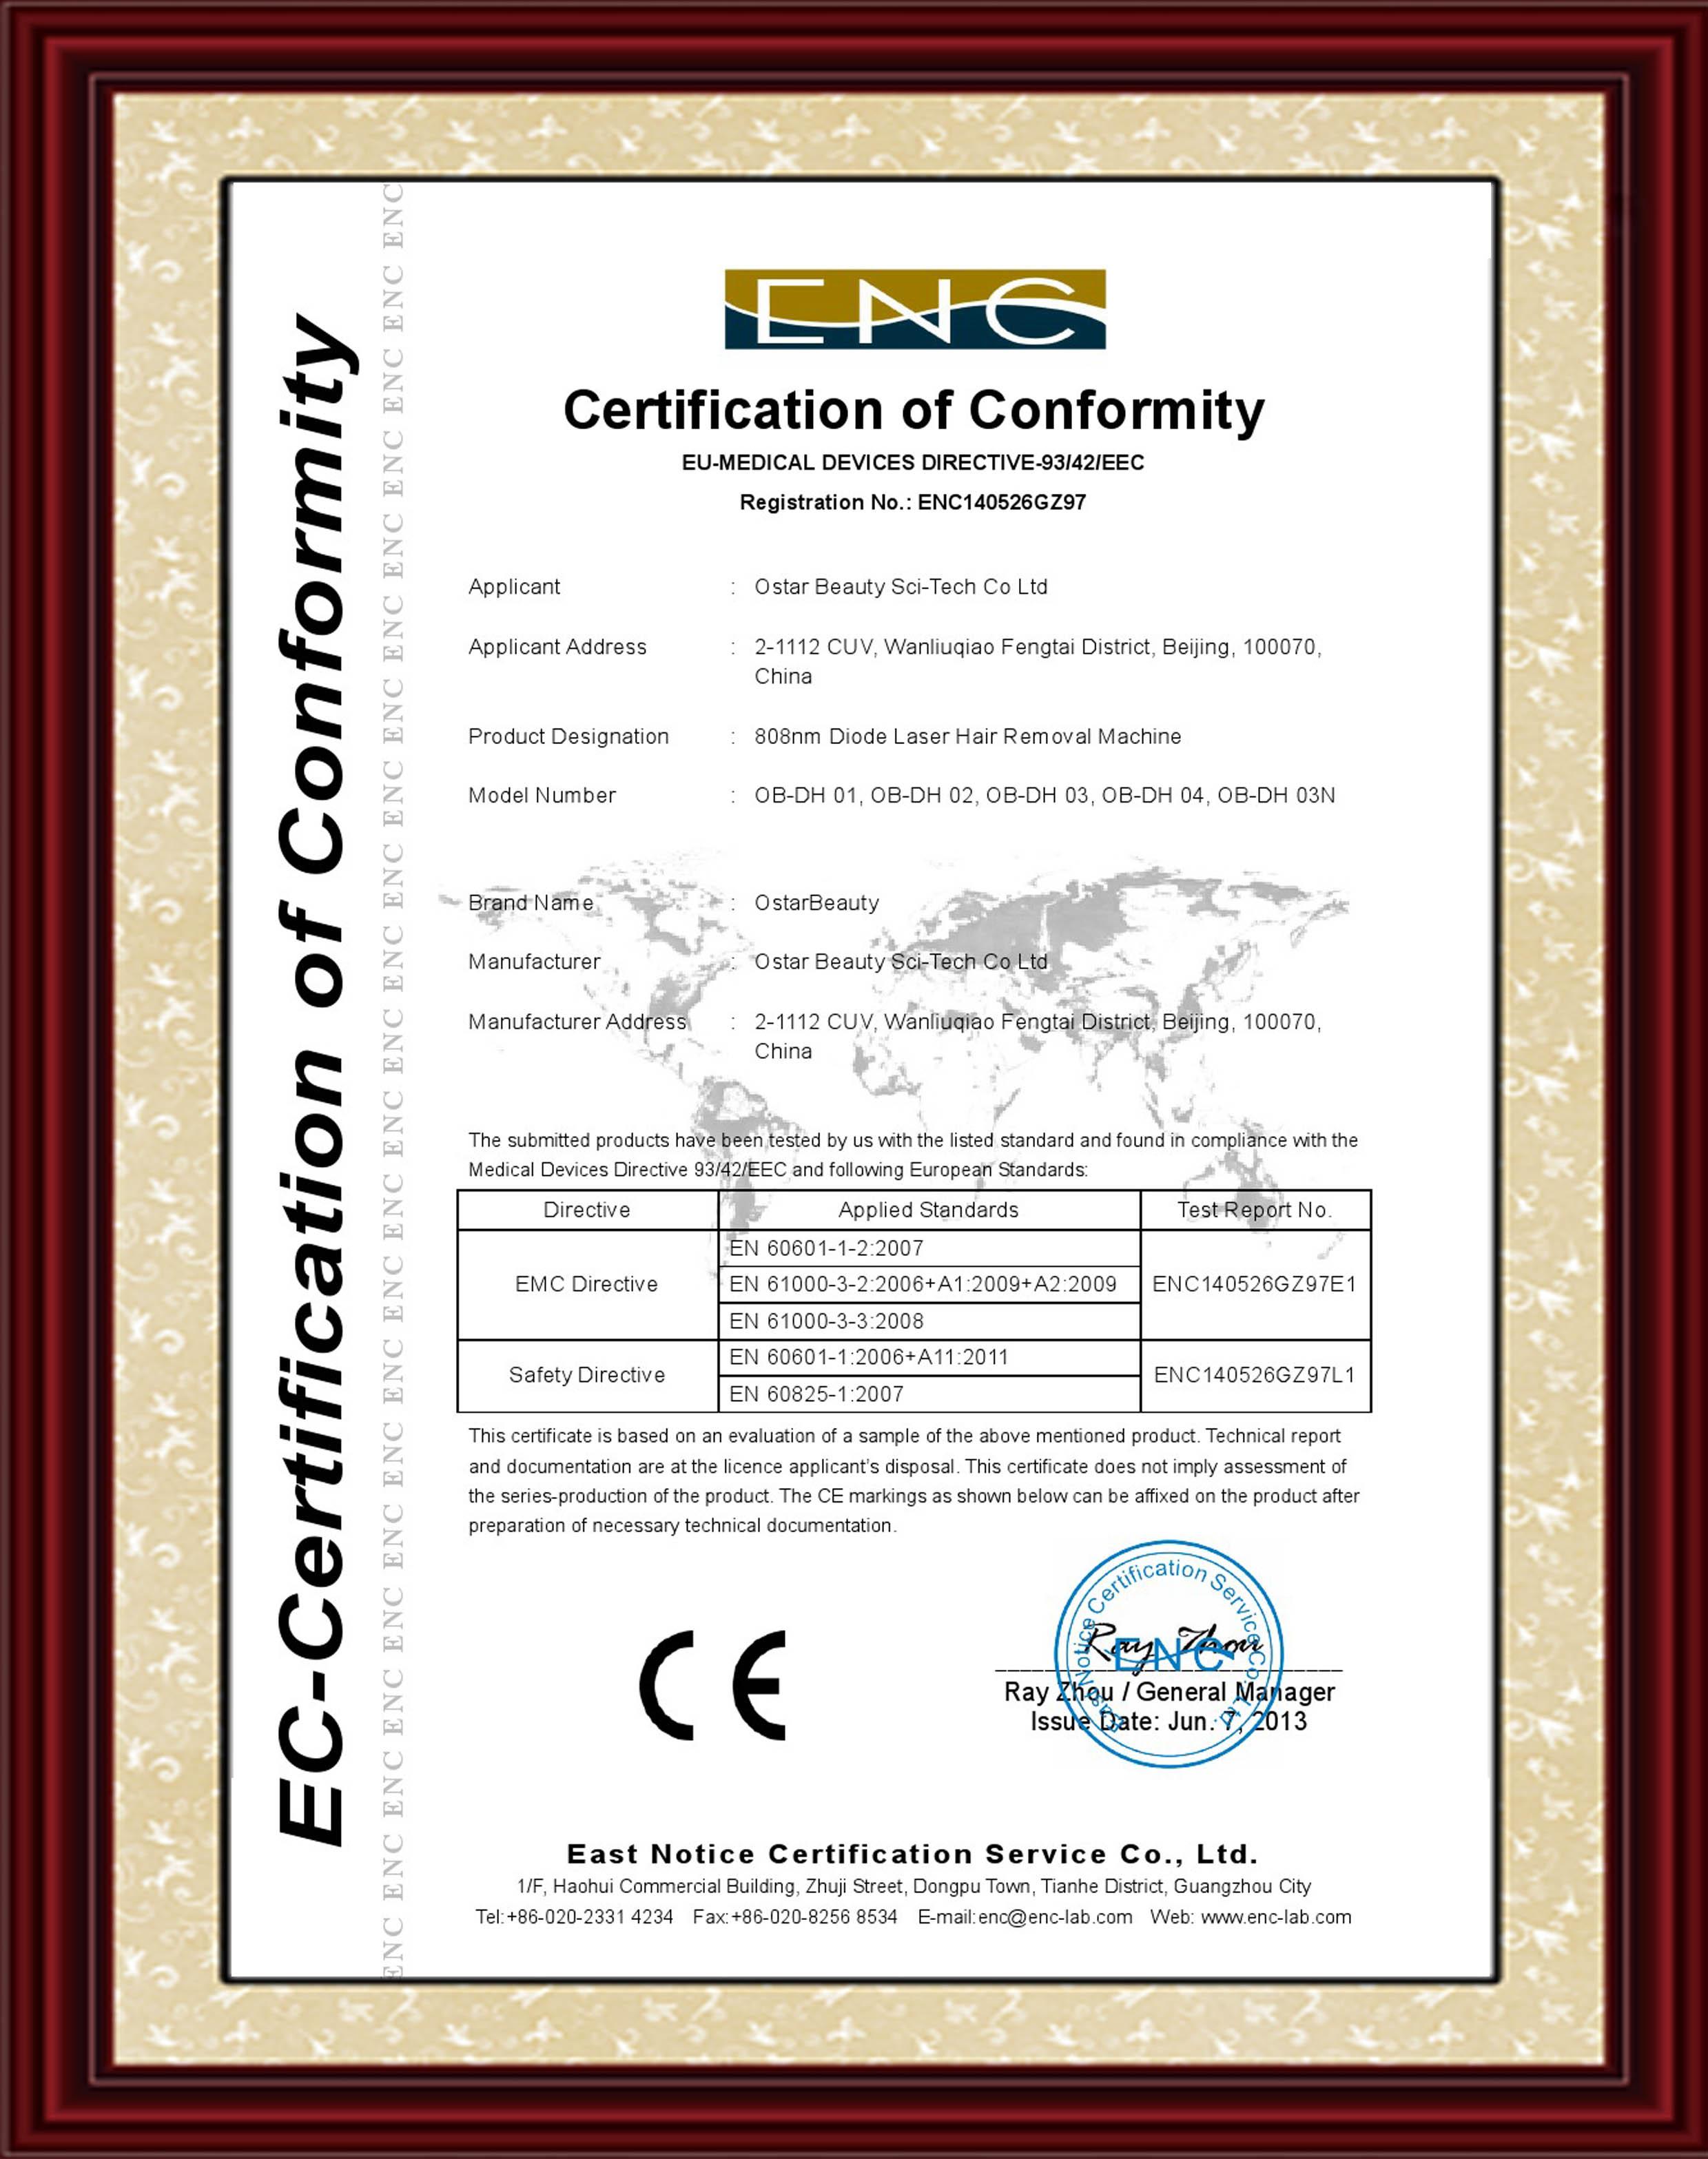 Certification ostar beauty sci tech co ltd diode laser eu mdd peel systemeu mdd xflitez Choice Image